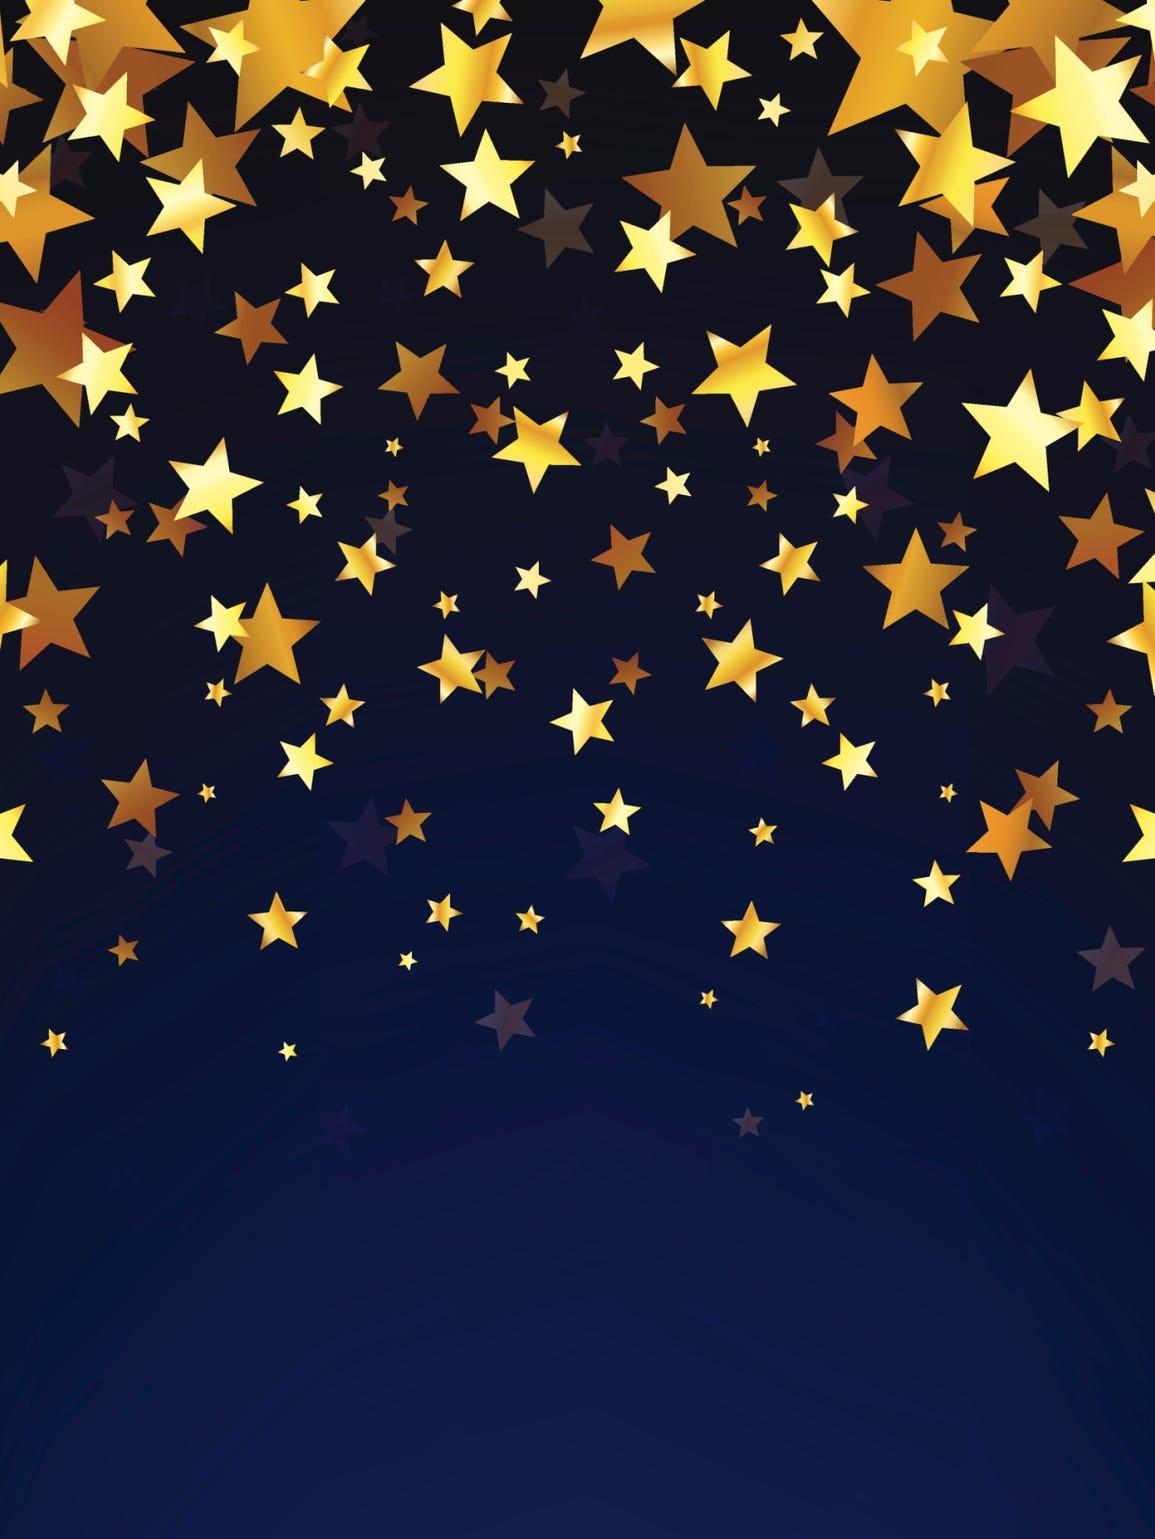 'Starry, Starry Night' fundraiser benefits St. Rose